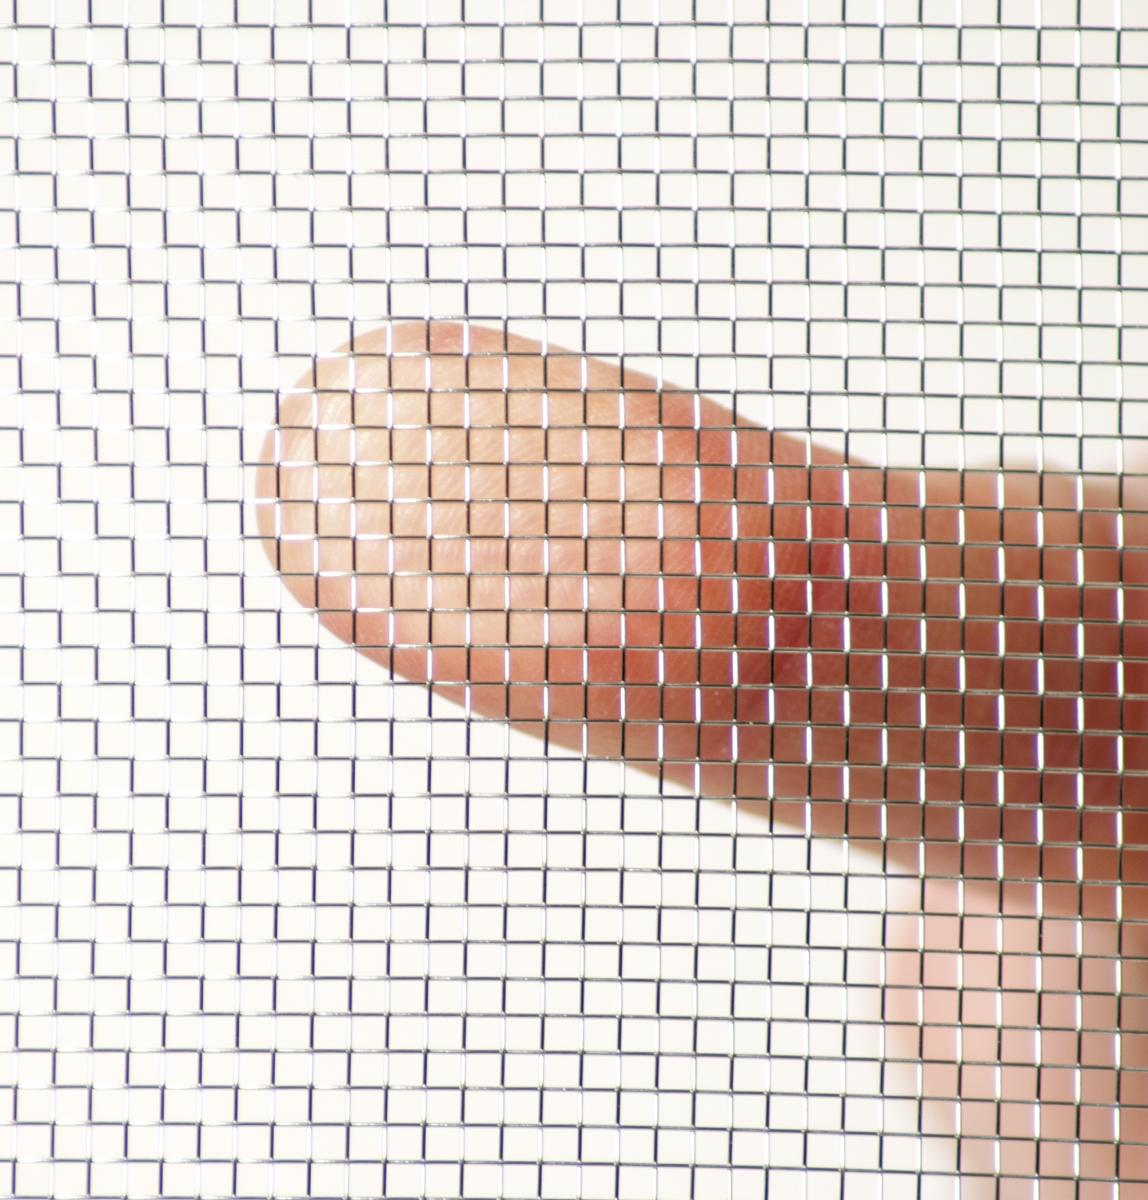 edelstahlgewebe_transparenzvergleich_finger